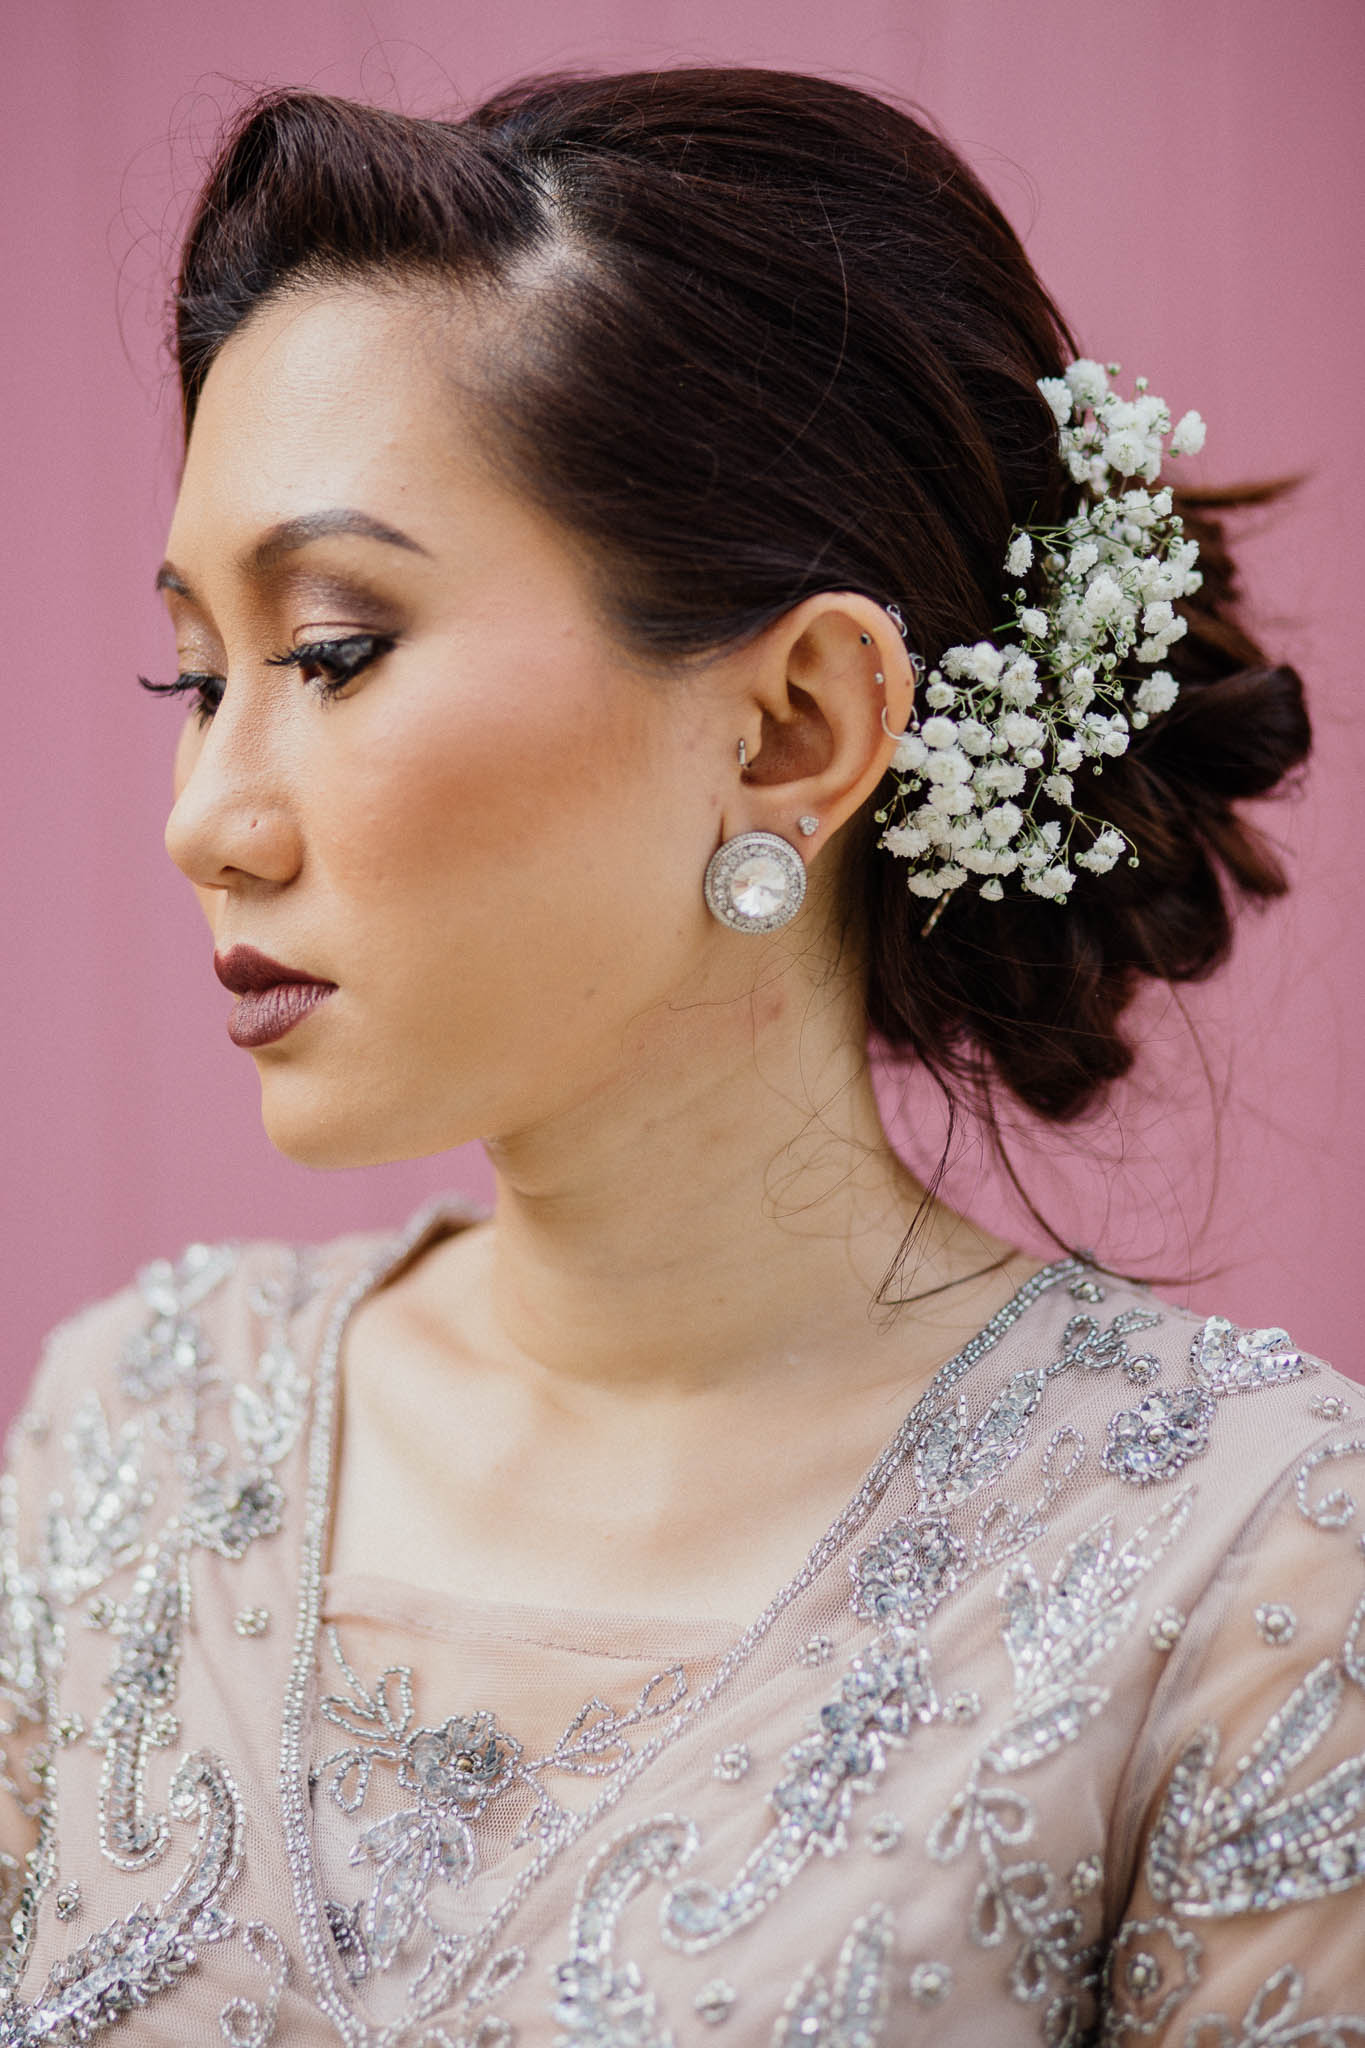 singapore-wedding-photographer-addafiq-nufail-082.jpg